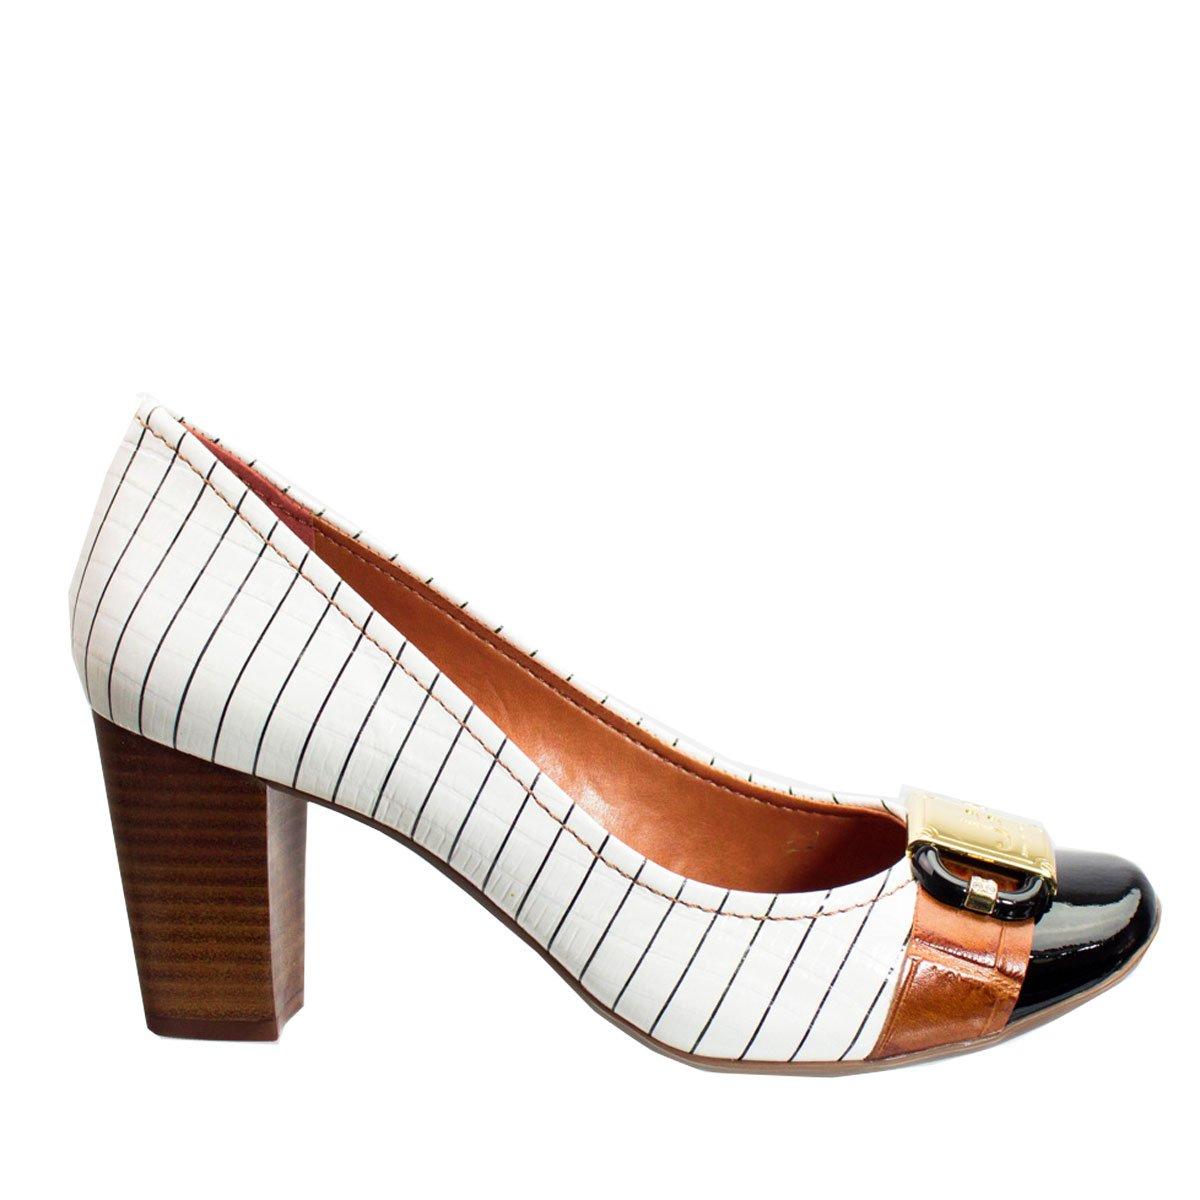 33026c4230 Bizz Store - Sapato Feminino Jorge Bischoff Risca Giz Verniz